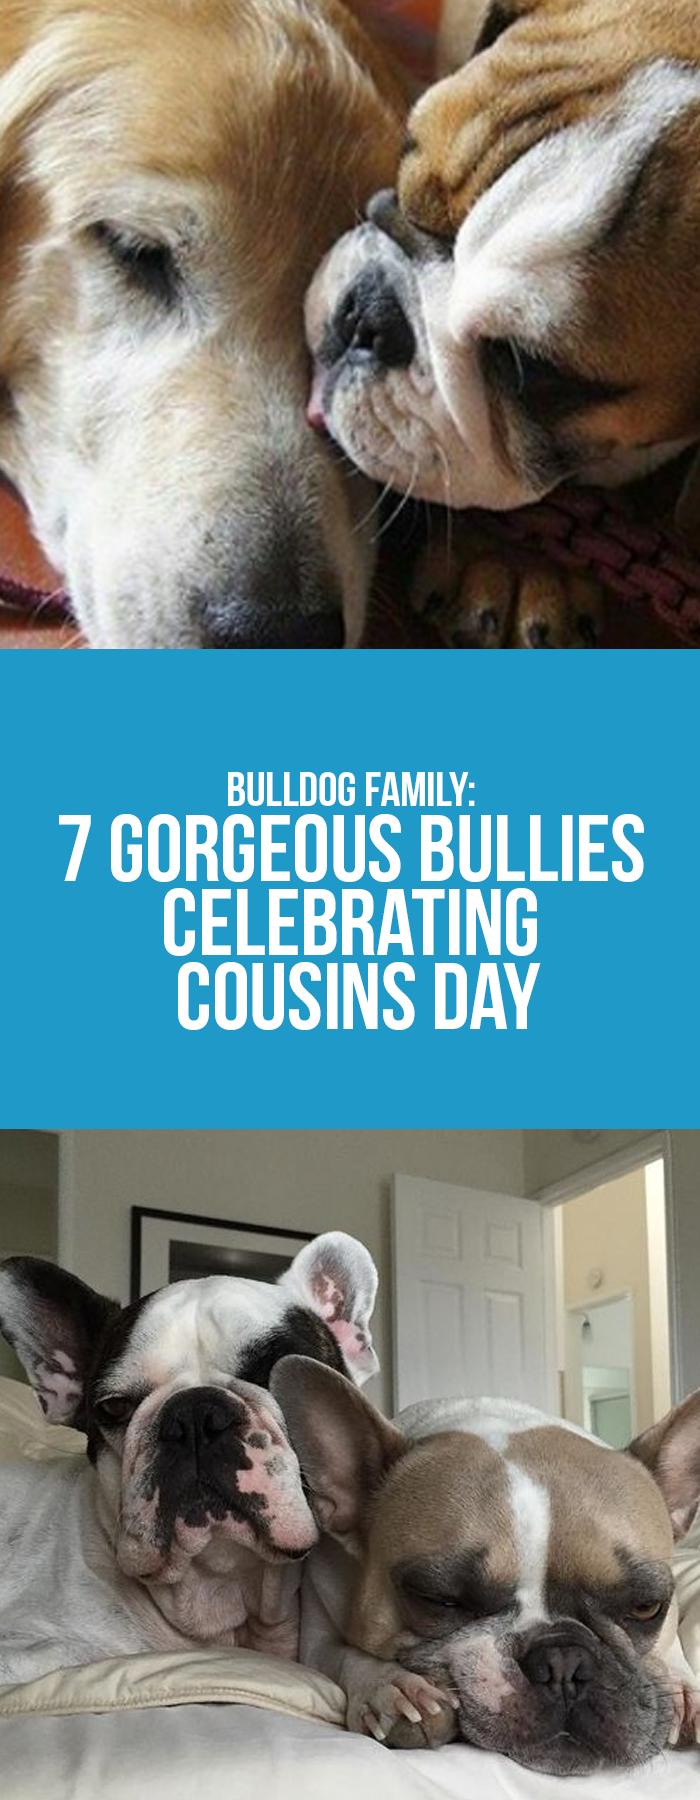 Bulldog Family 7 Bullies Celebrating Cousins Day